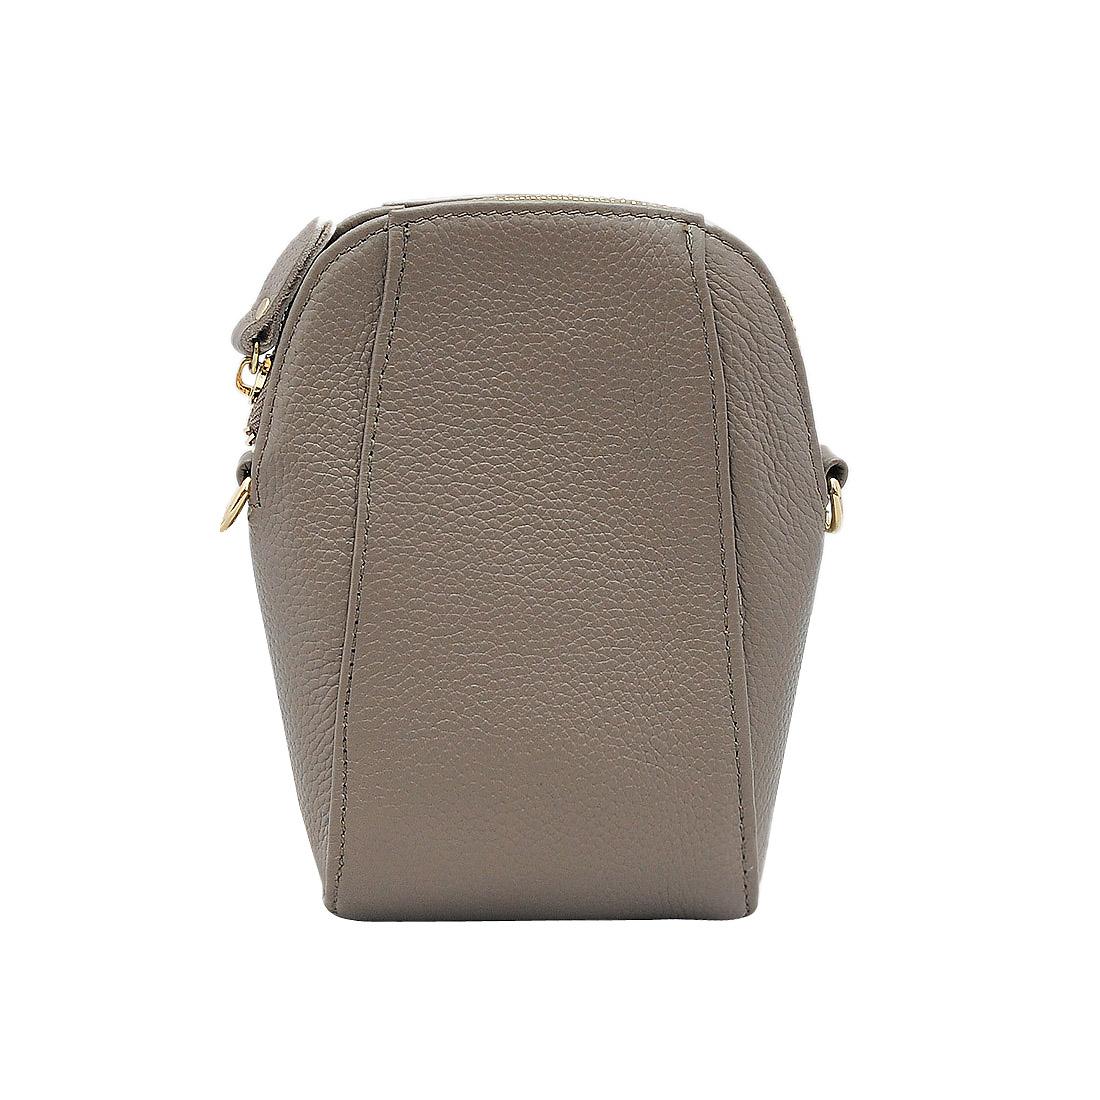 Túi đeo chéo nữ ELMI da bò thật cao cấp màu ghi ET579